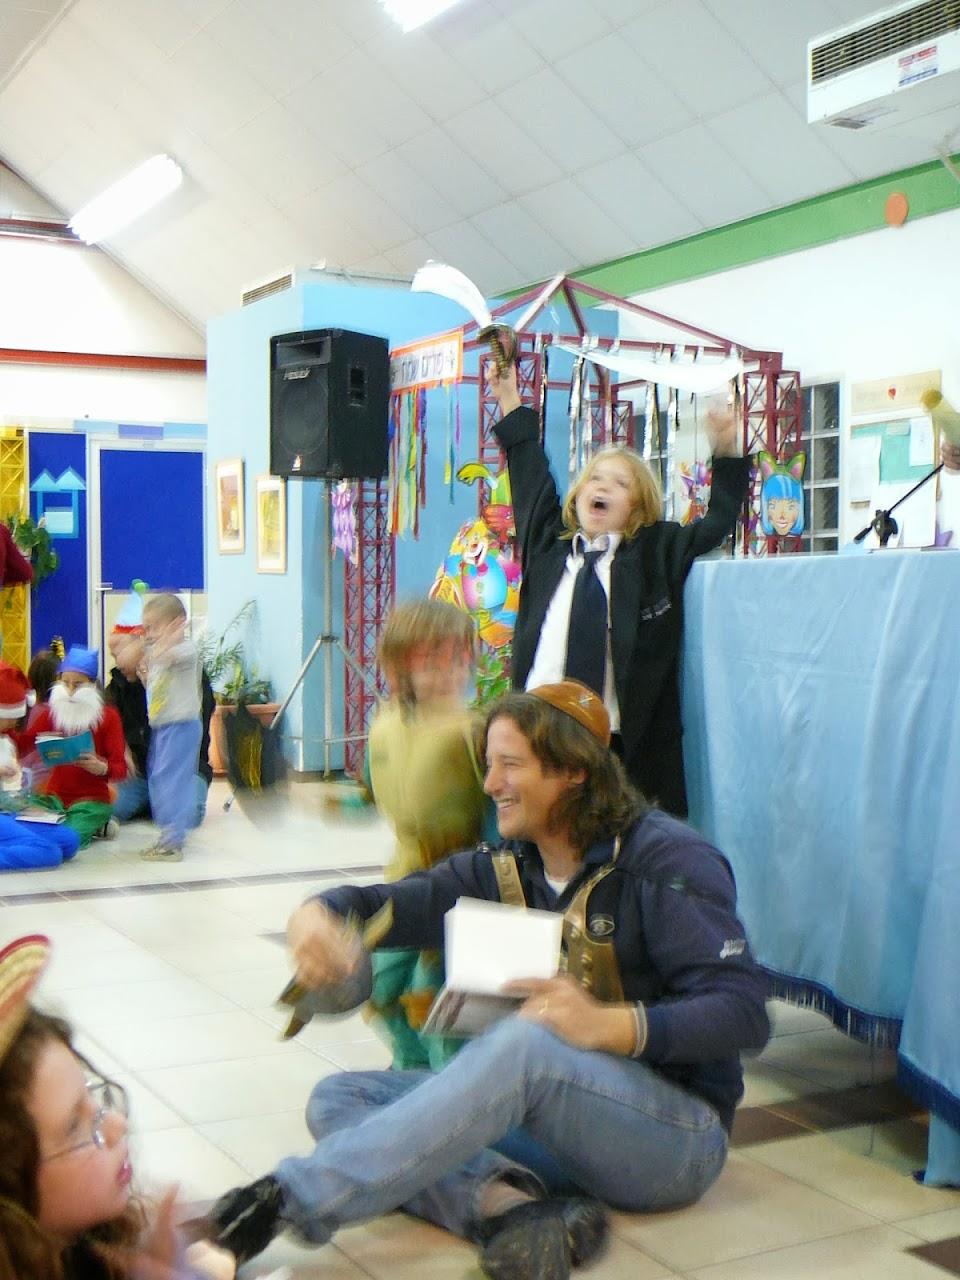 Purim 2007  - 2007-03-03 13.19.35.jpg